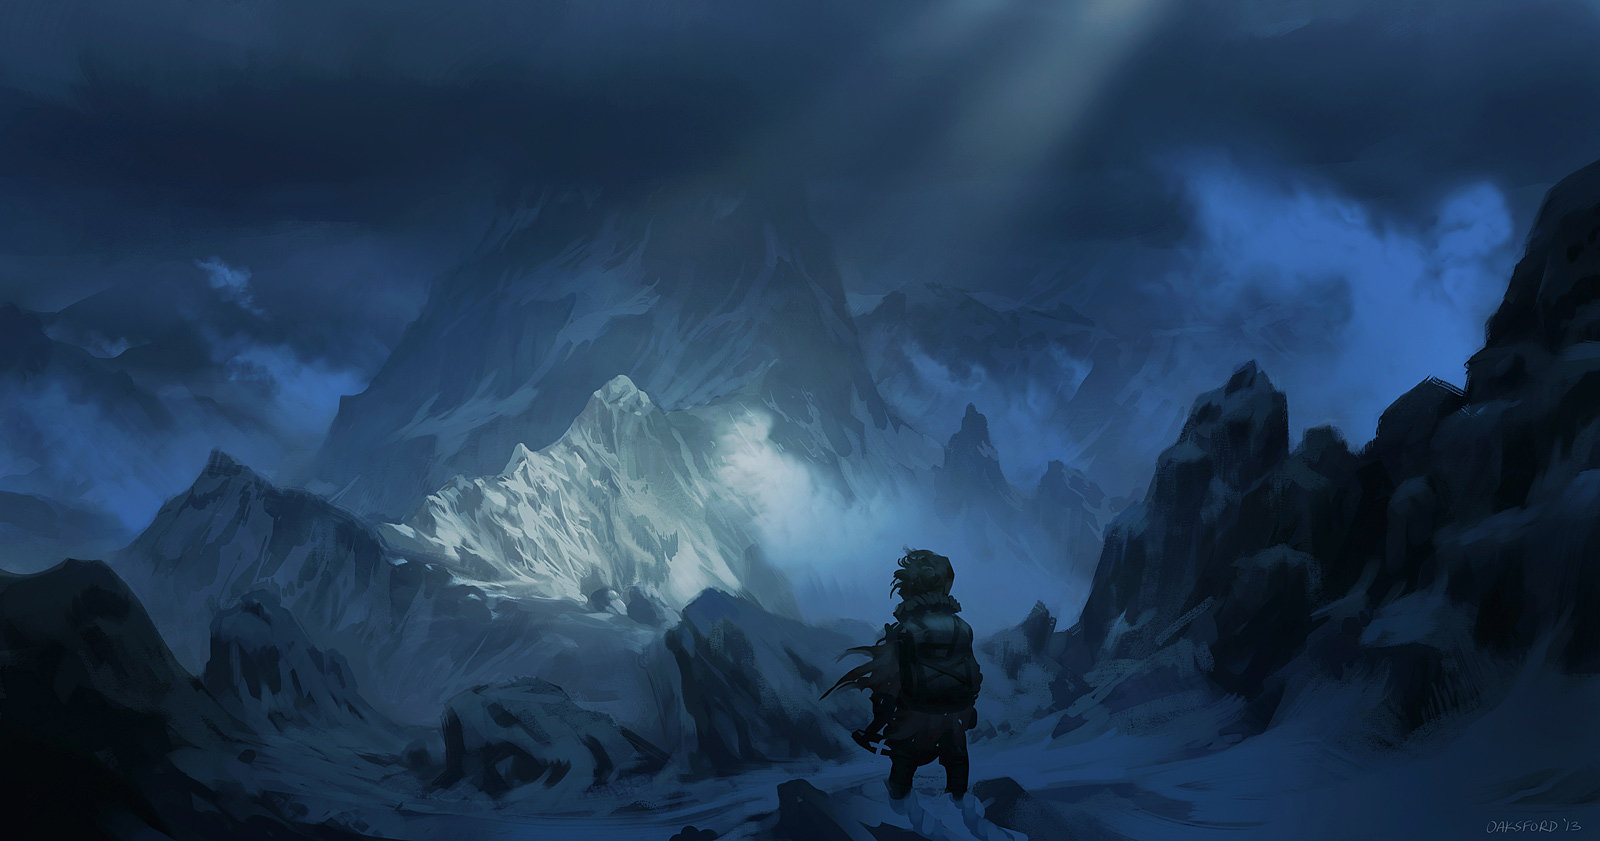 Fantasy Wallpaper - Misty Mountains by Justin Oaksford